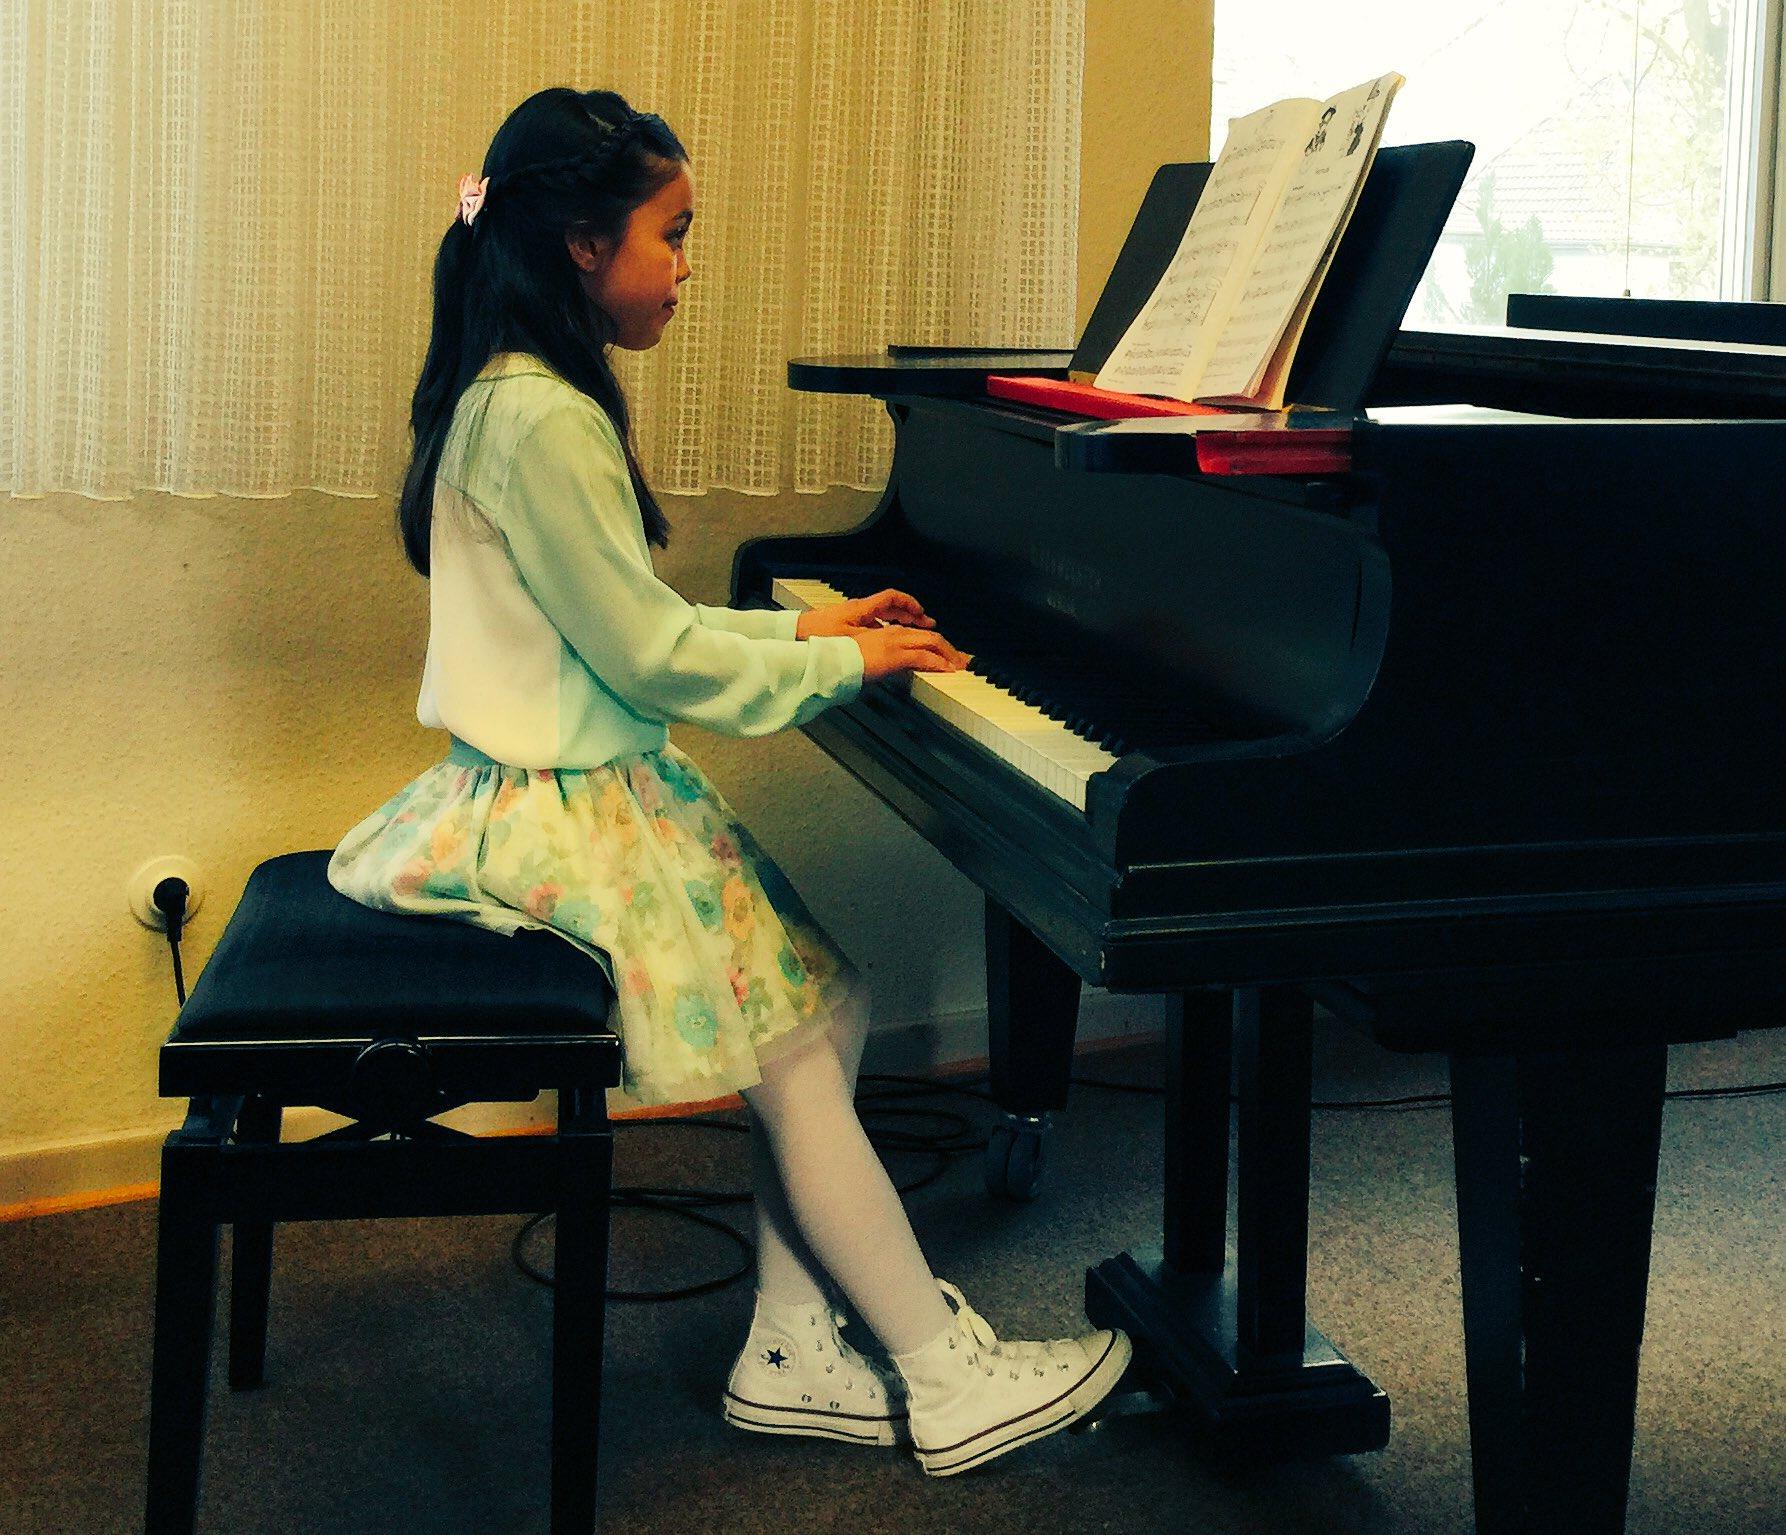 Musikschule @duisburg_de hat heute ein tolles Programm zusammengestellt. Herzl. Glückw. an alle jungen MusikerInnen! https://t.co/N8ByTV16St